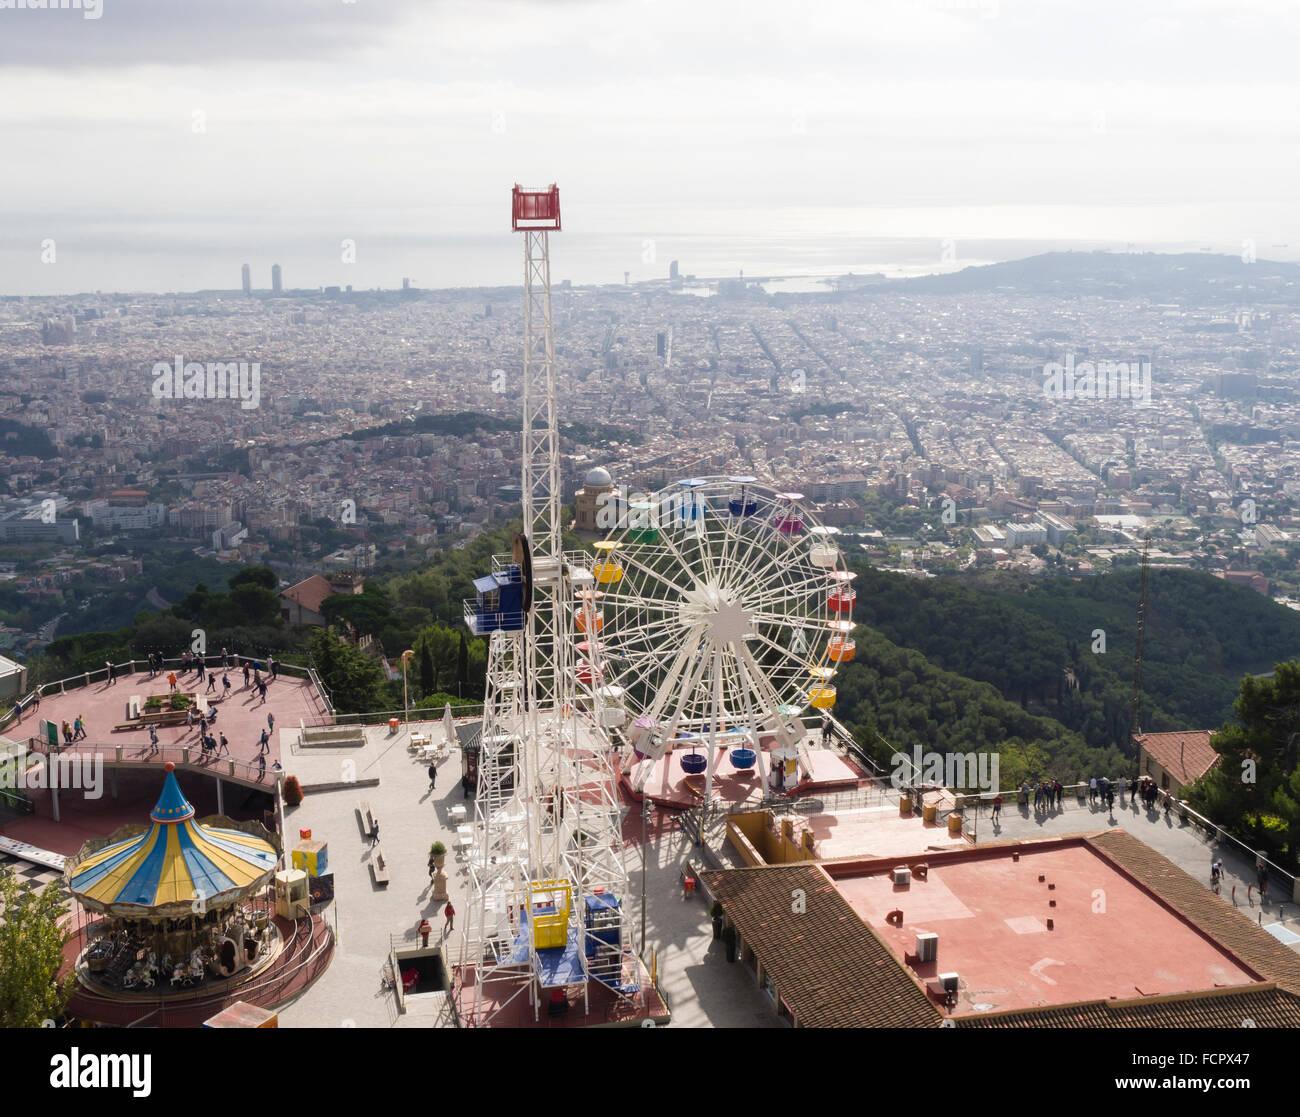 Amusement park on top of Tibidabo Mountain, Barcelona, Spain Stock Photo, Roy...